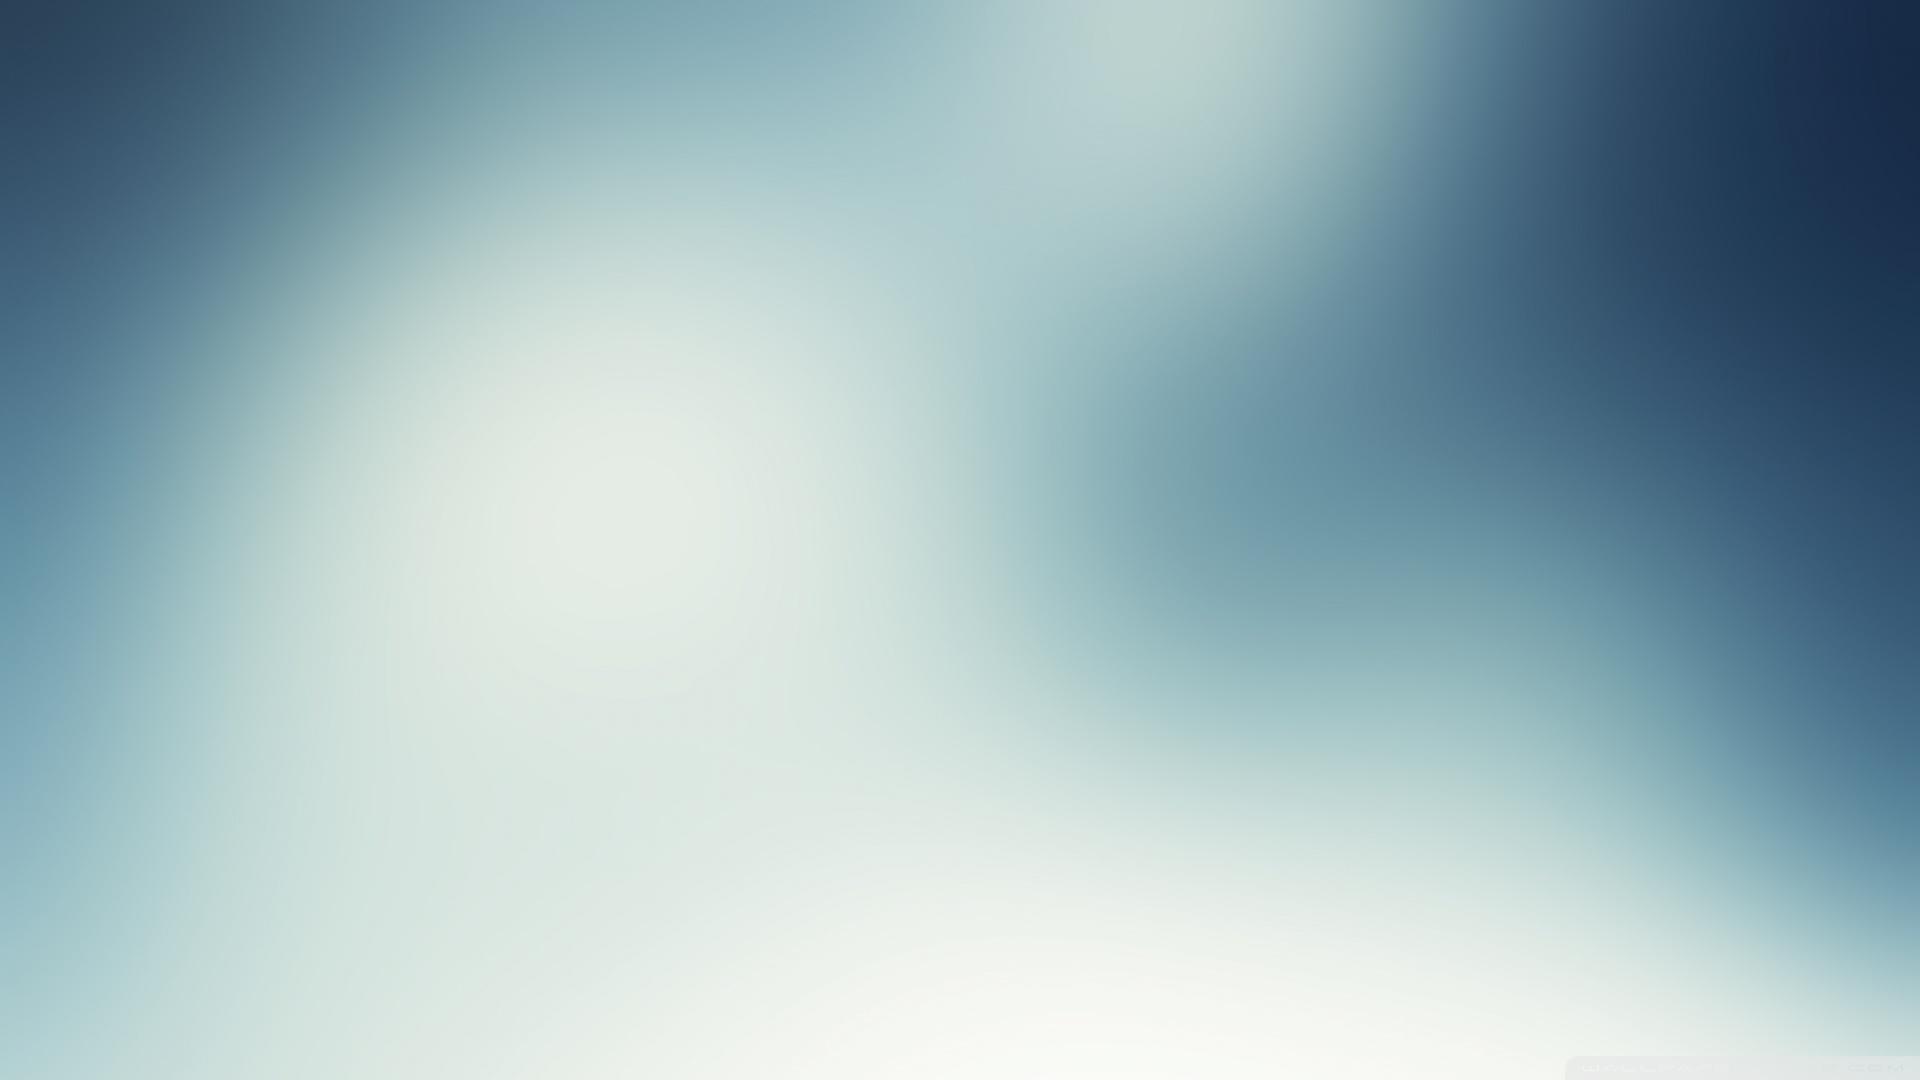 minimalist_background_iv-wallpaper-1920×1080